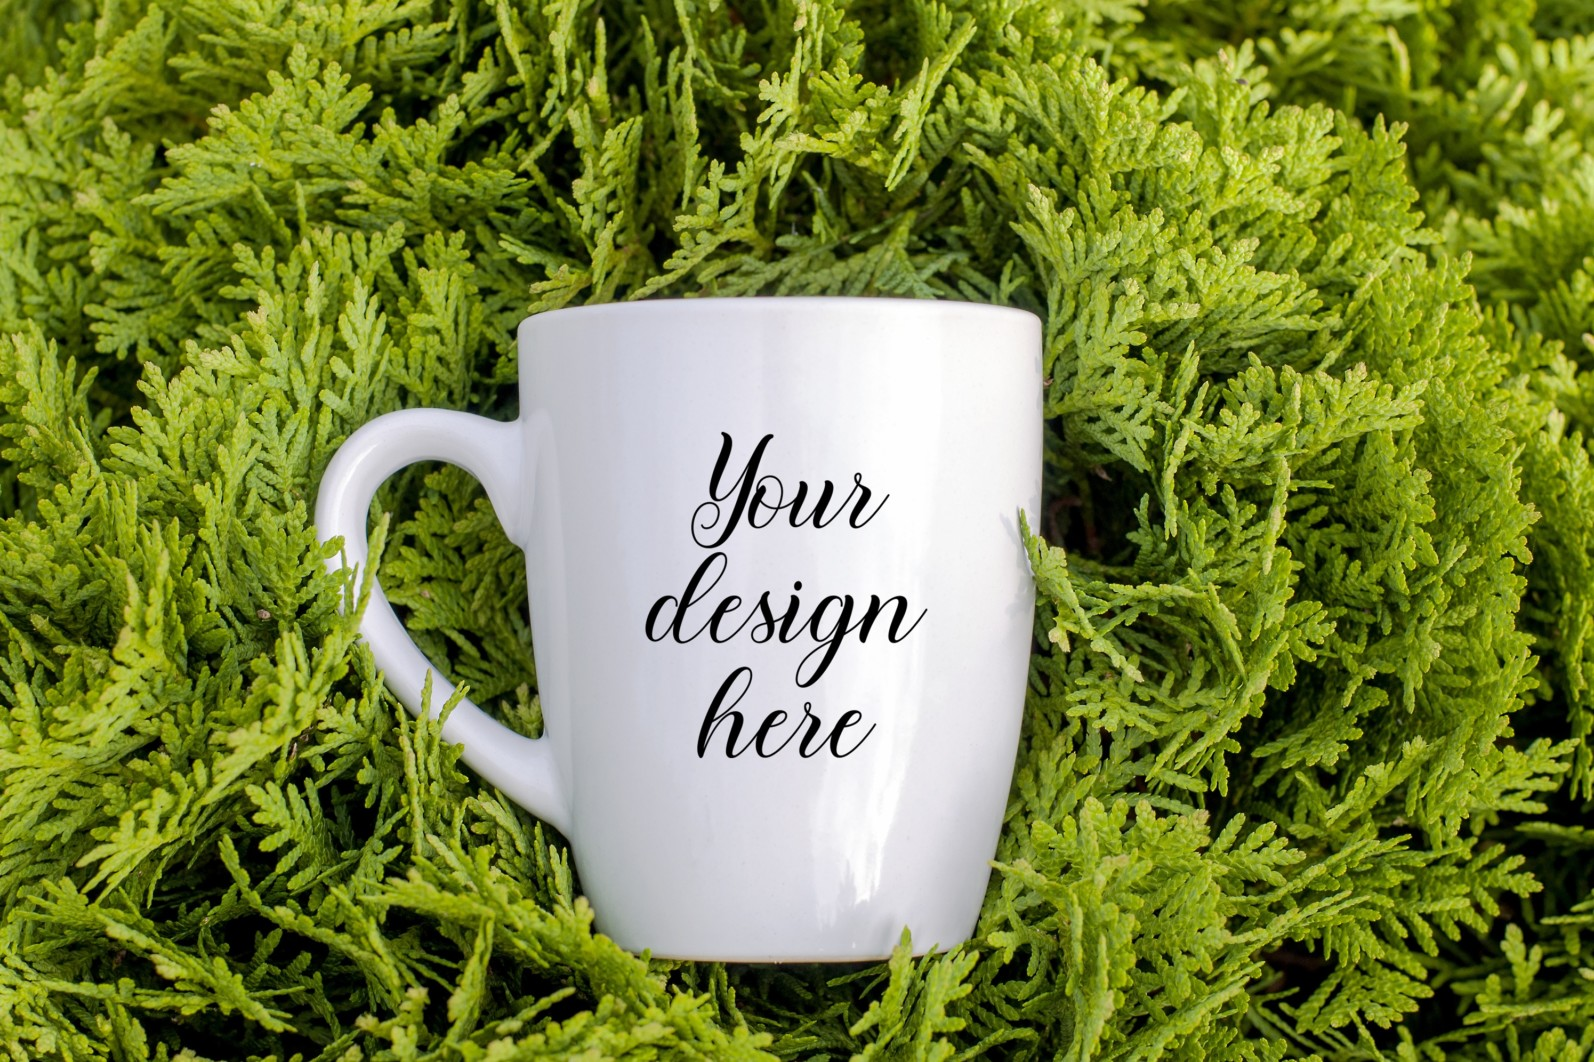 Coffee mug mockup bundle. Mug template bundle. PSD, JPEG files. - 4 1 1 scaled -